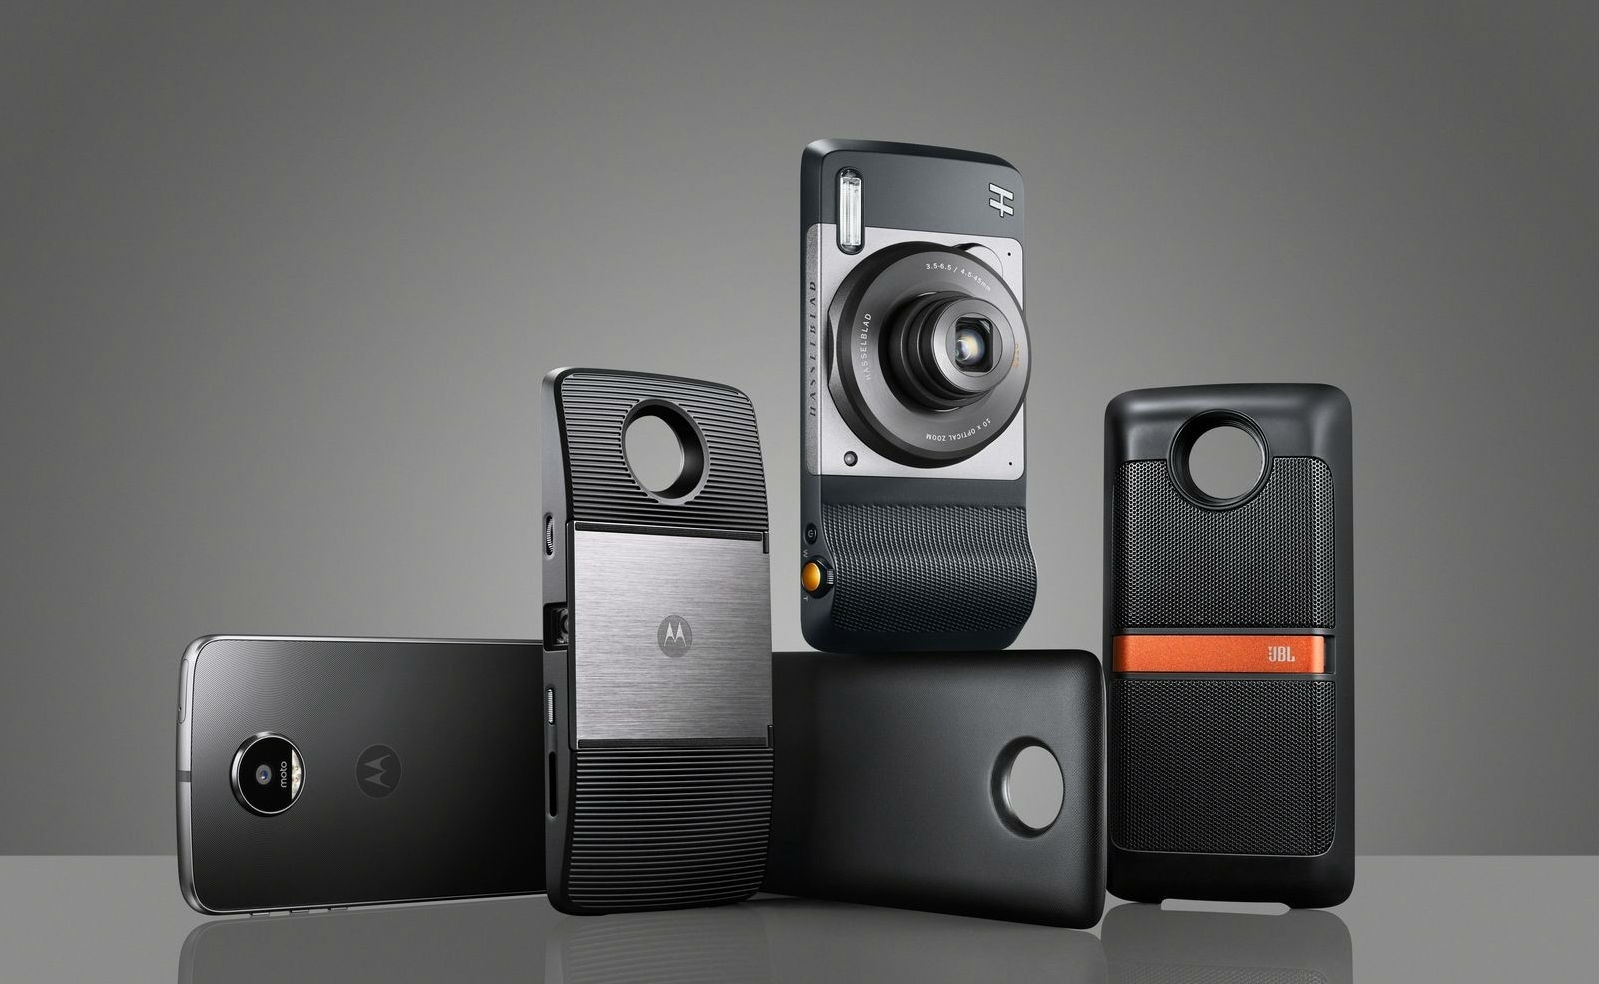 Как настроить фотоаппарат для съемки дискотеки извещатели